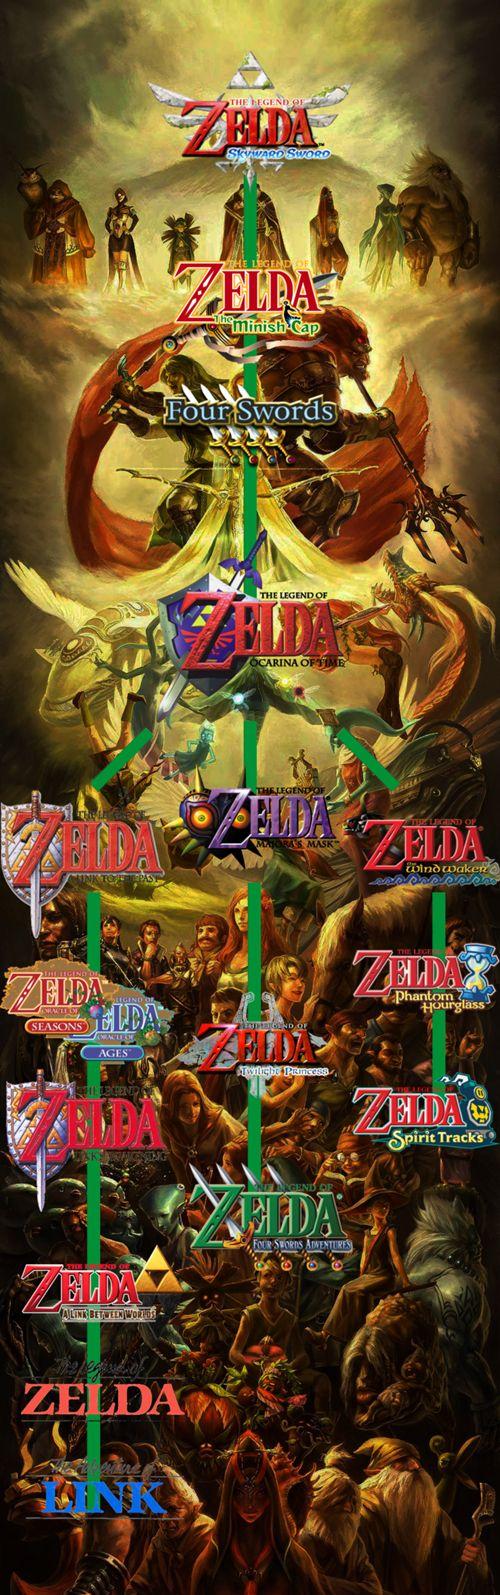 The Legend of Zelda Cronology